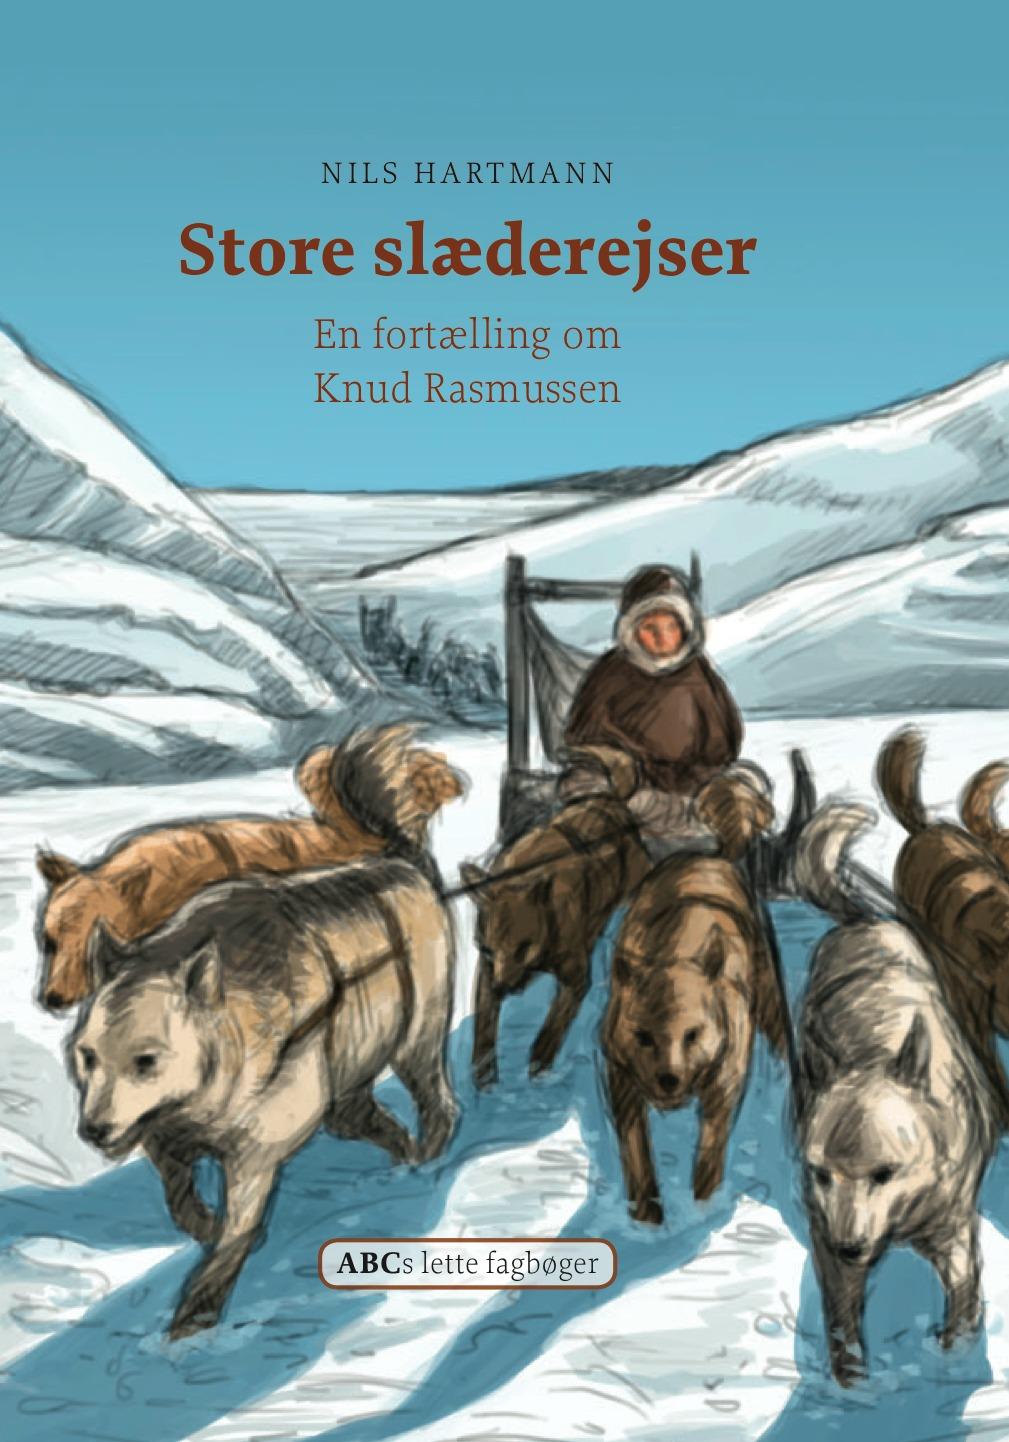 Knud Rasmussen – forside